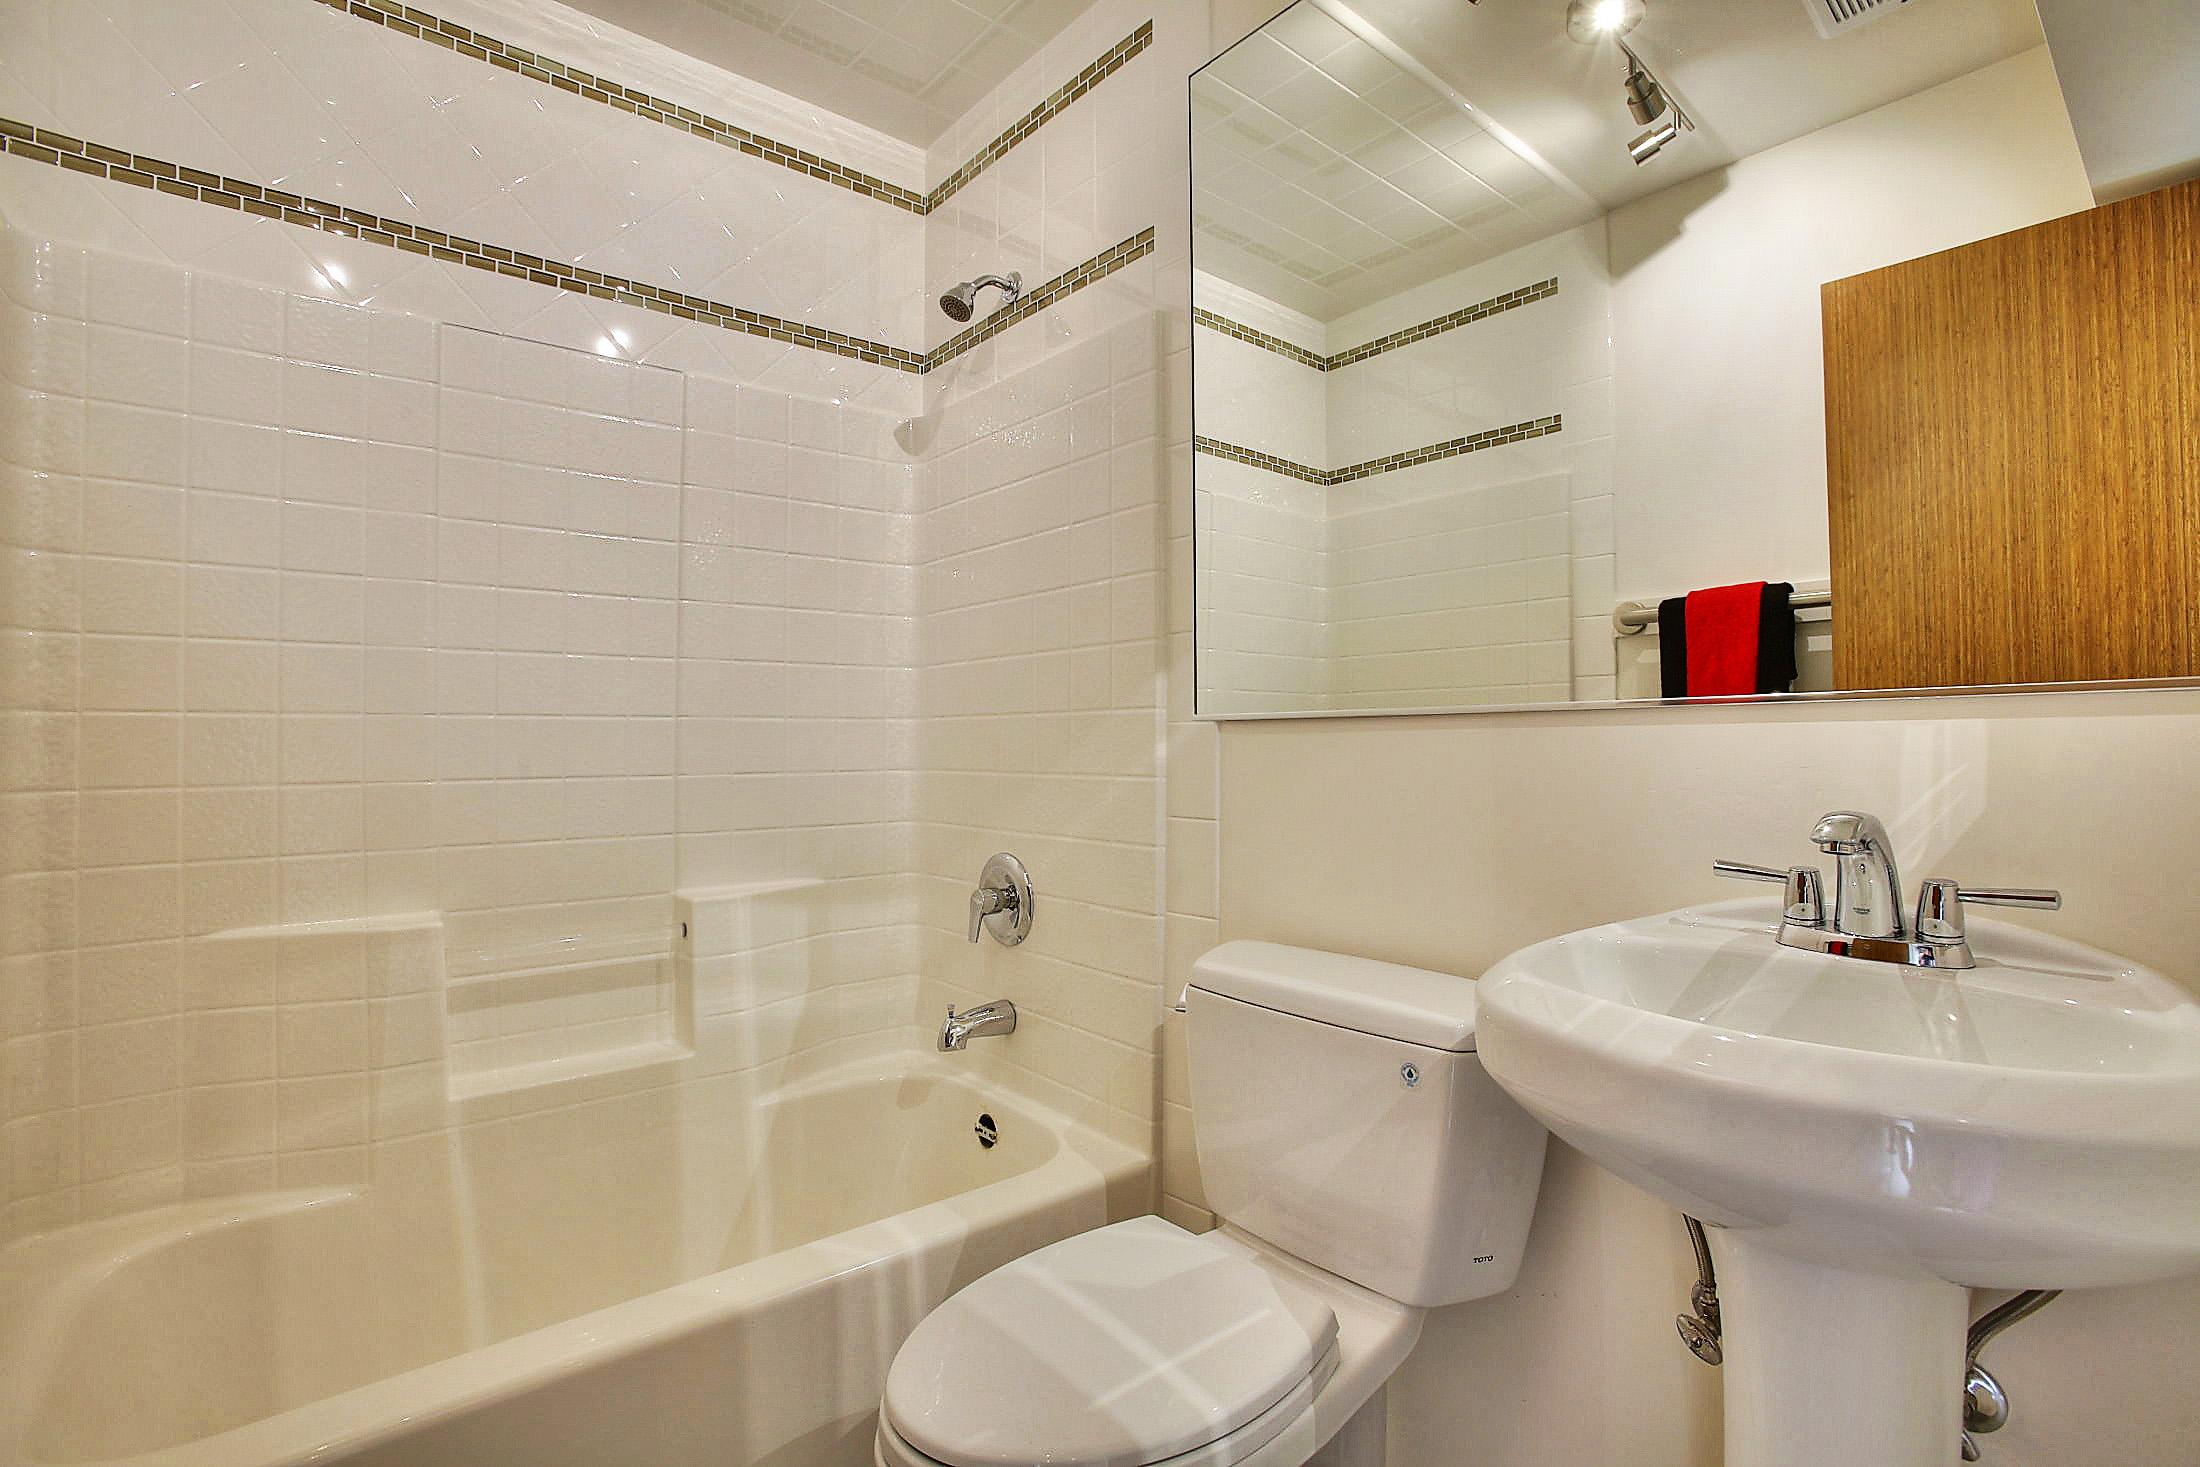 17_SkyLoft_Bathroom1.jpg